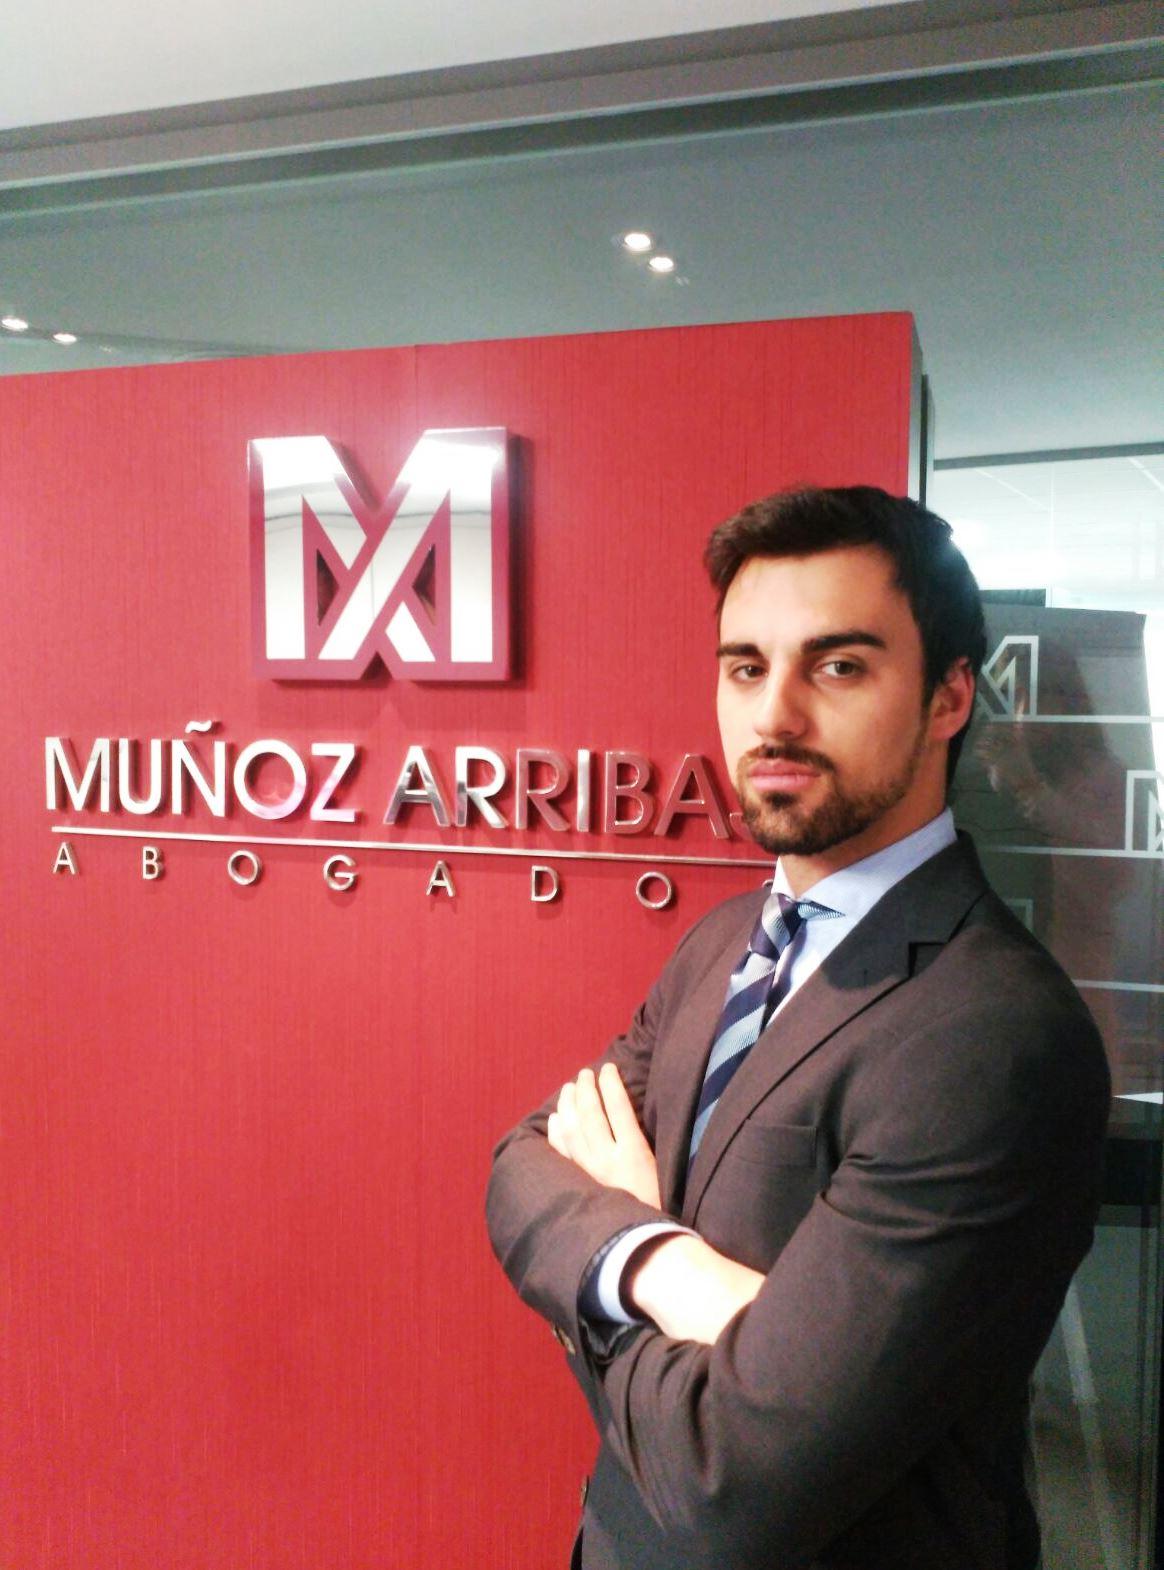 Victor gallego Muñoz Arribas